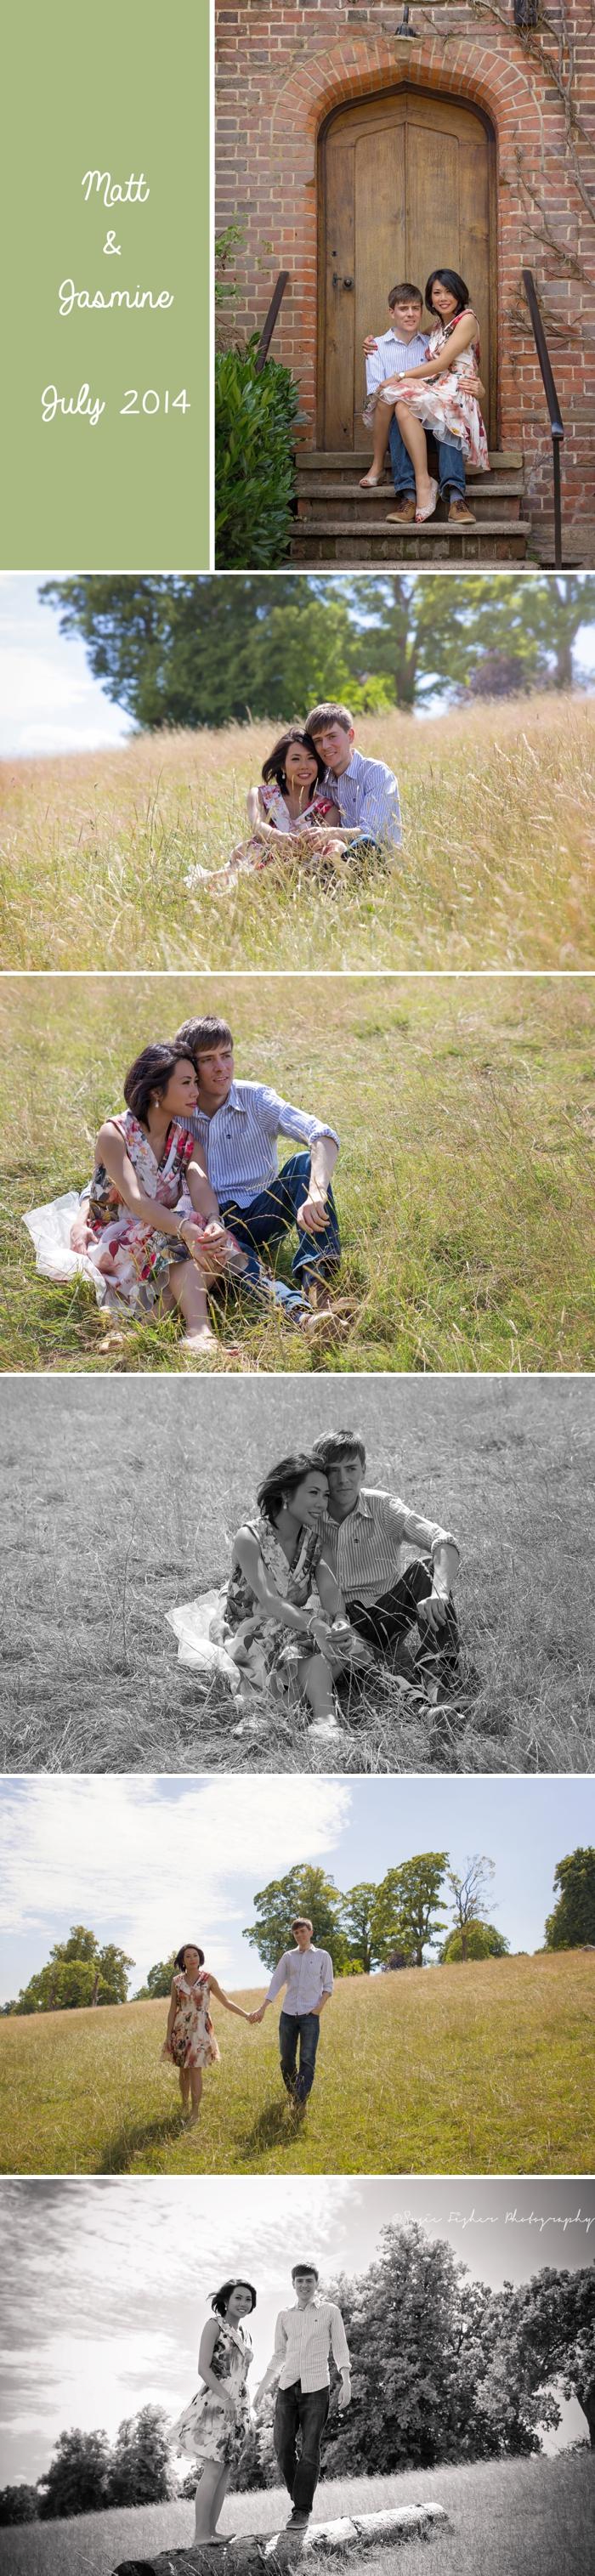 engagement photographs at hughenden manor.jpg